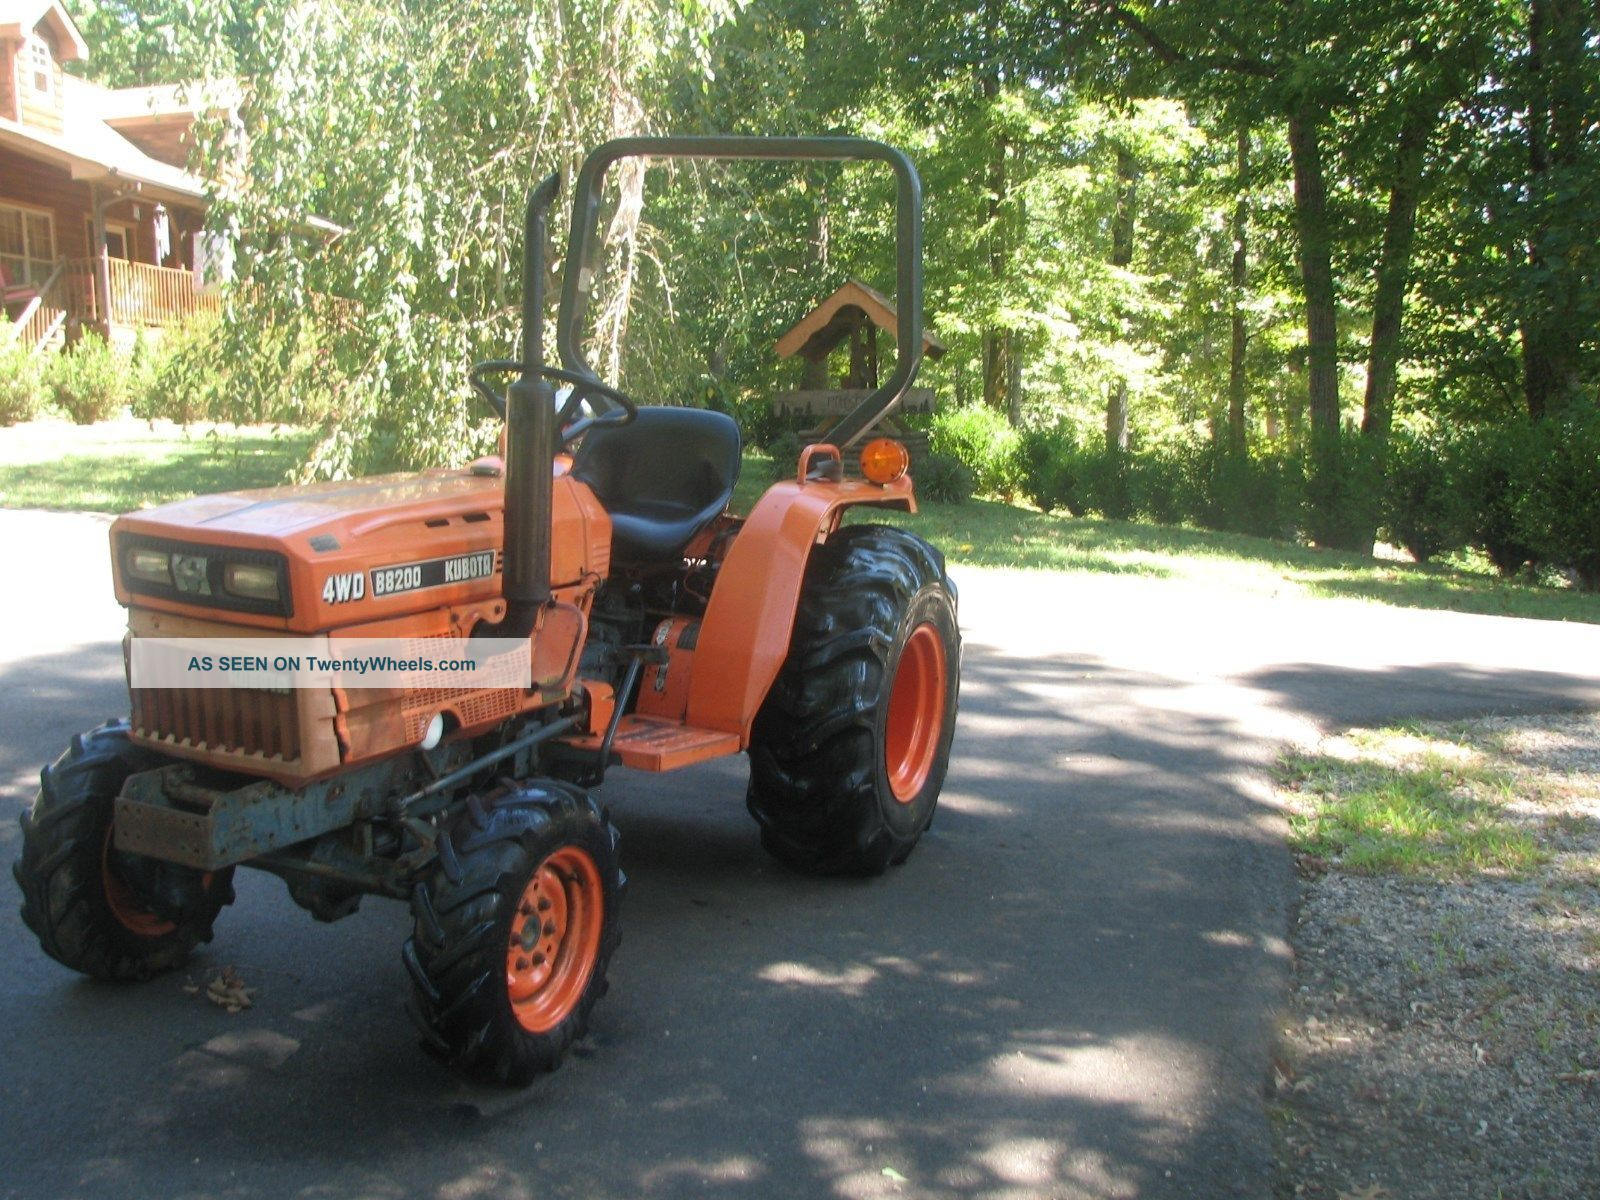 Kubota Diesel B8200 4wd Tractor,  3 Cylinder,  19 Hp,  With Bushhog & Boxblade Tractors photo